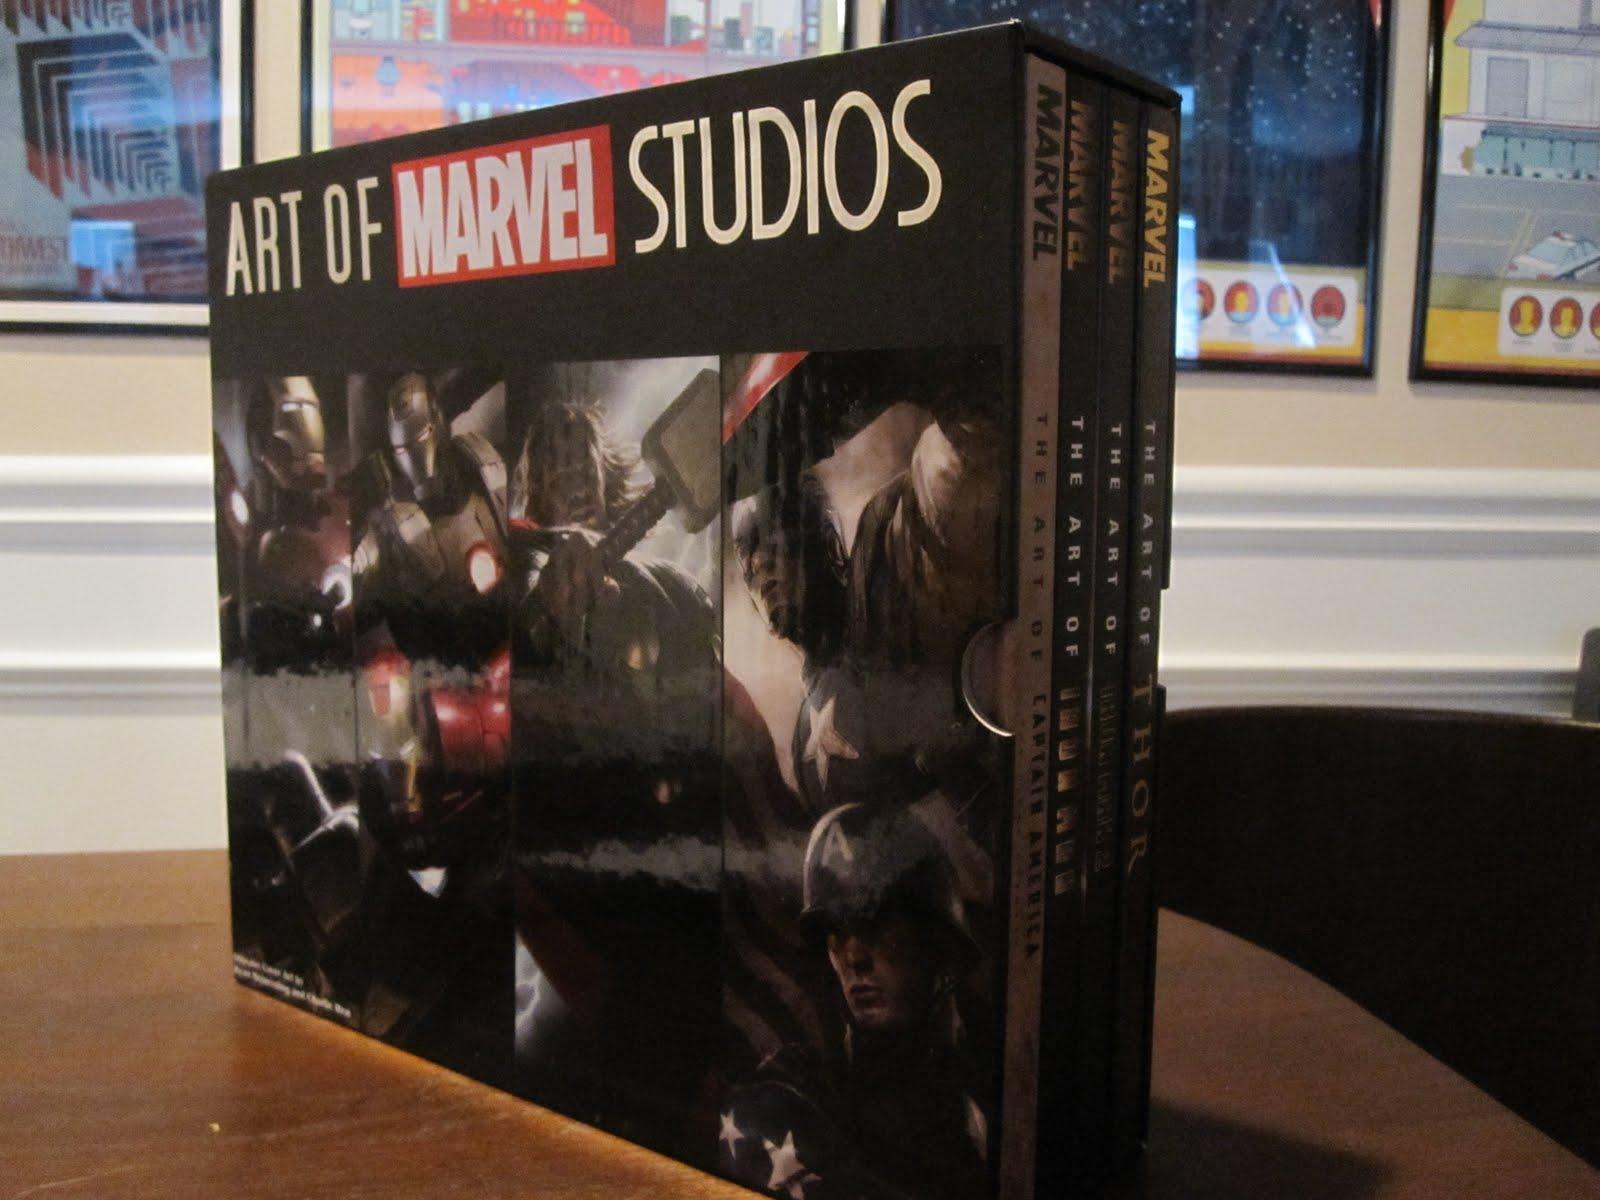 http://1.bp.blogspot.com/-n6QattIYv28/ToTfFweHsVI/AAAAAAAAE2s/hMqH9zkVPPw/s1600/the-art-of-marvel-studios-book-image-01.jpg